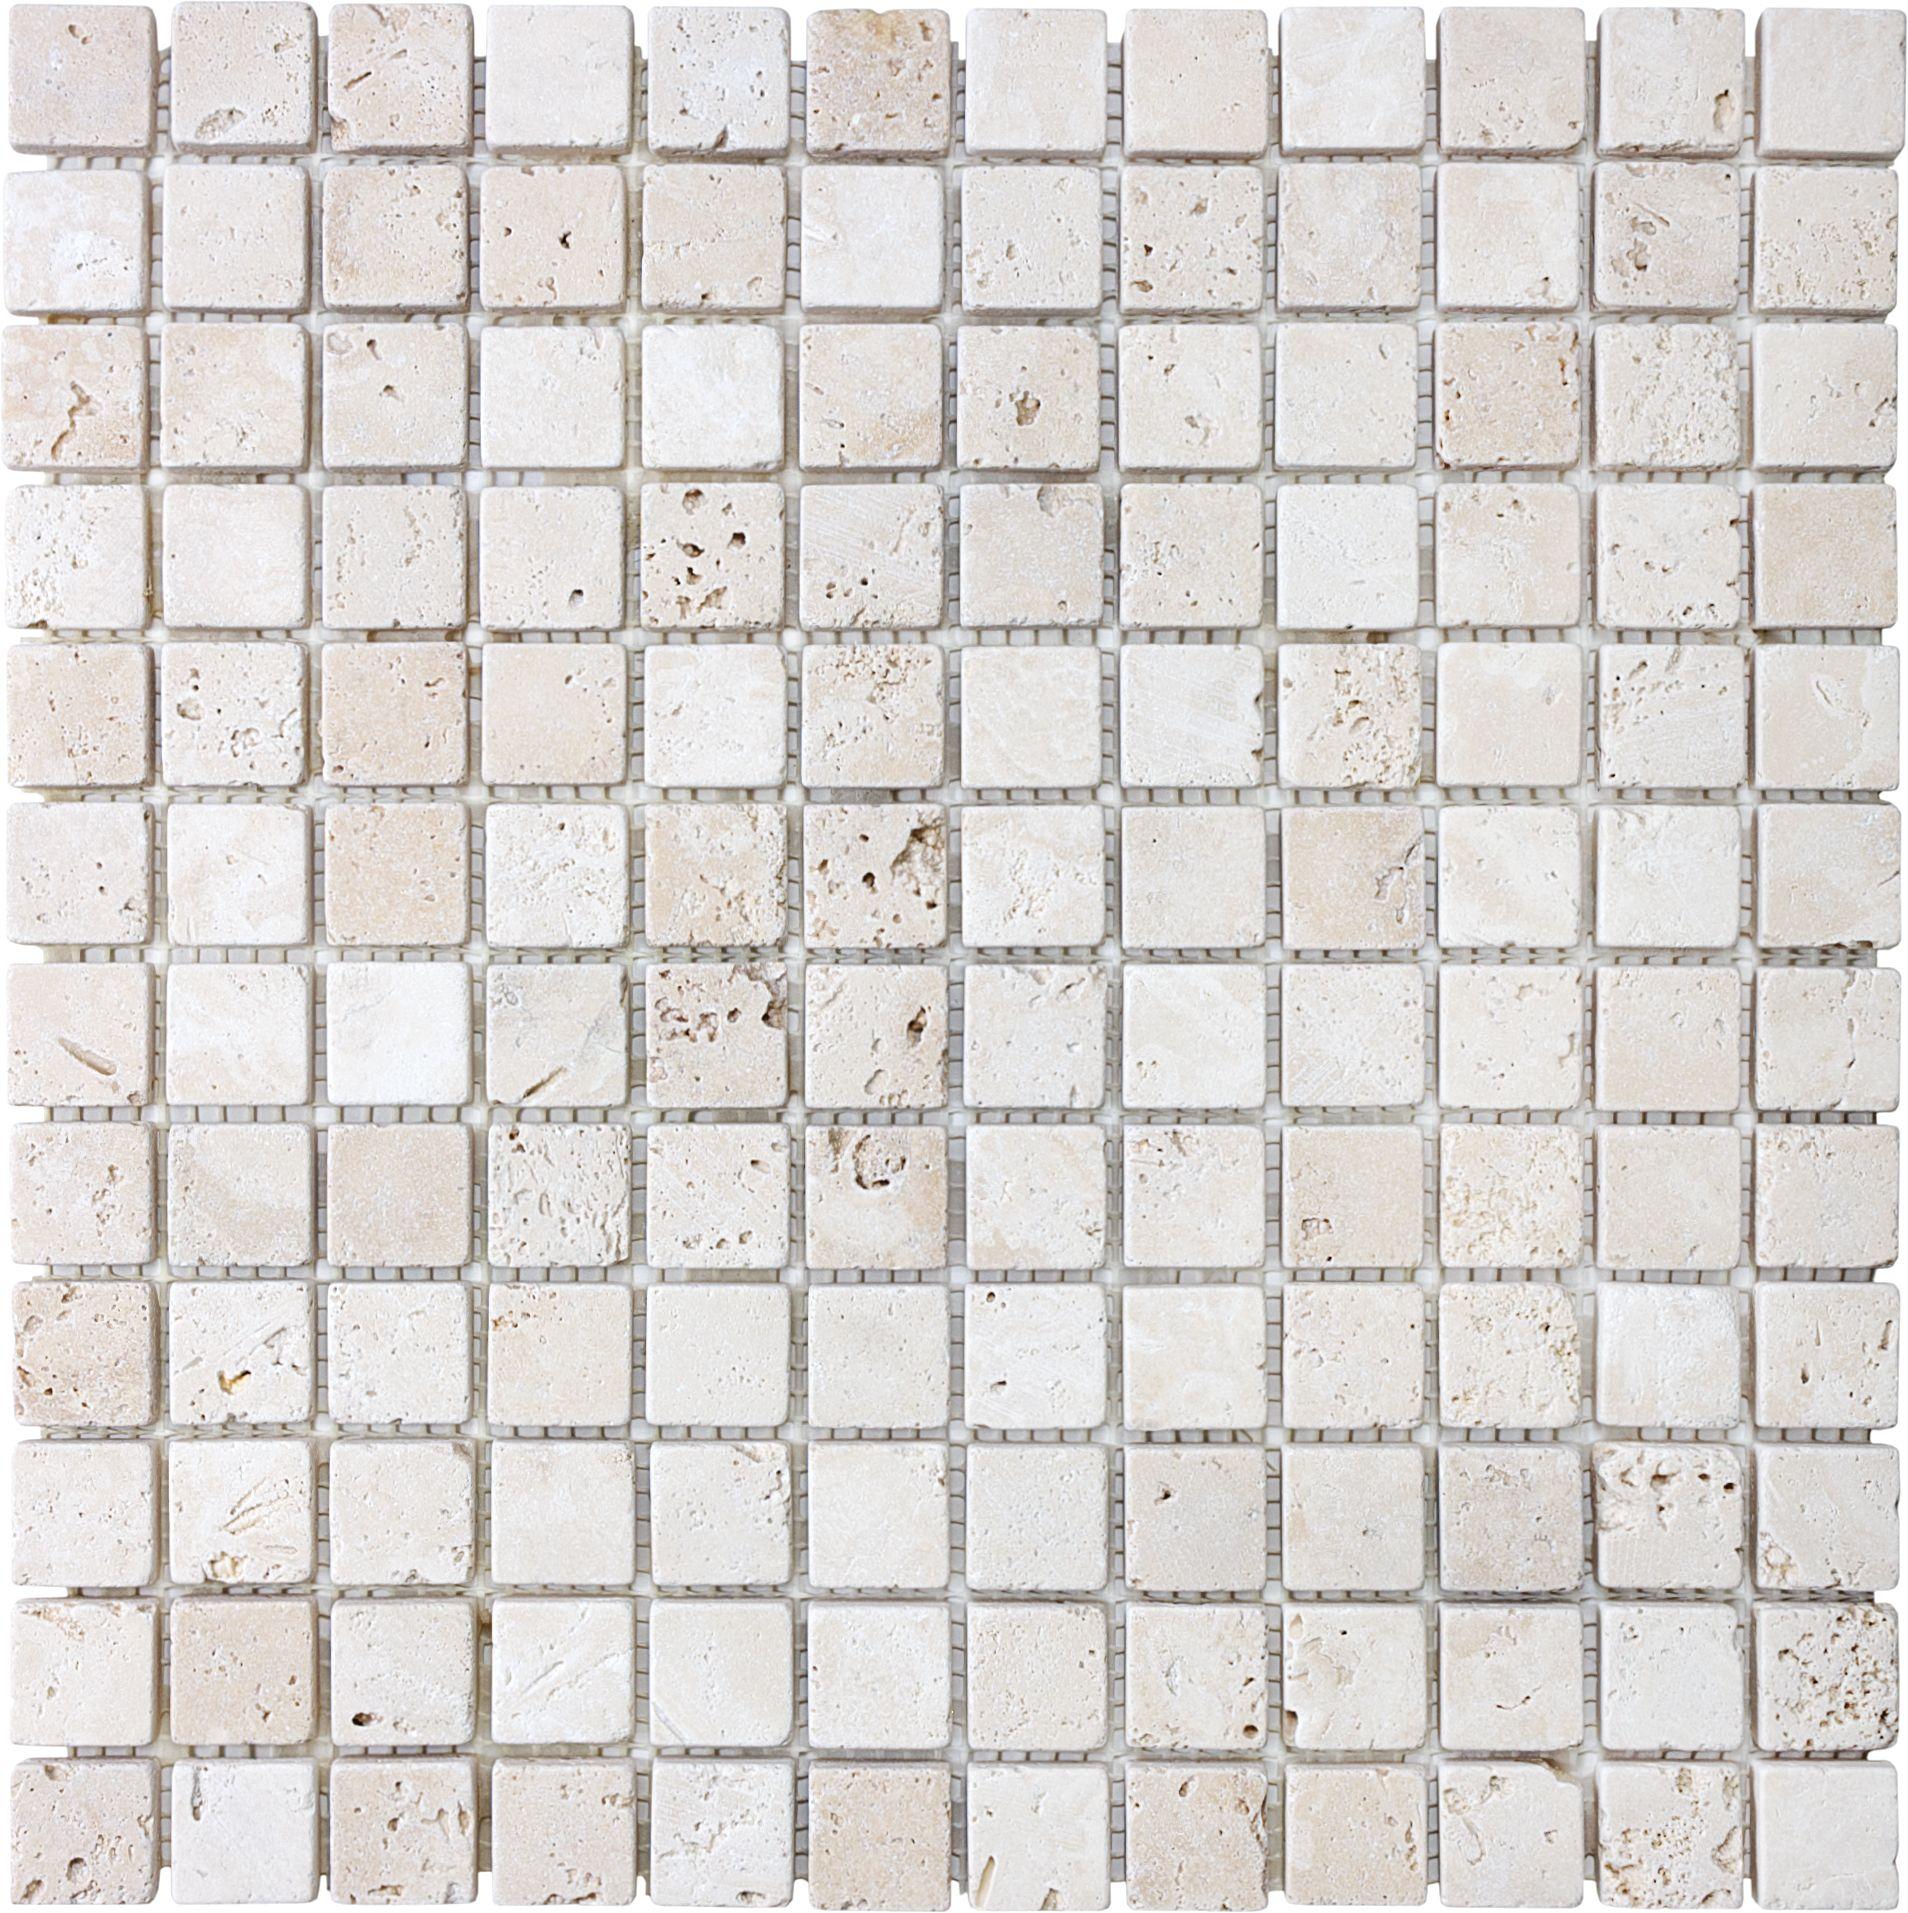 1 X1 Tumbled Travertine Mosaic Tile Www Anatoliatile Com Travertine Travertine Mosaic Tiles Home Depot Canada